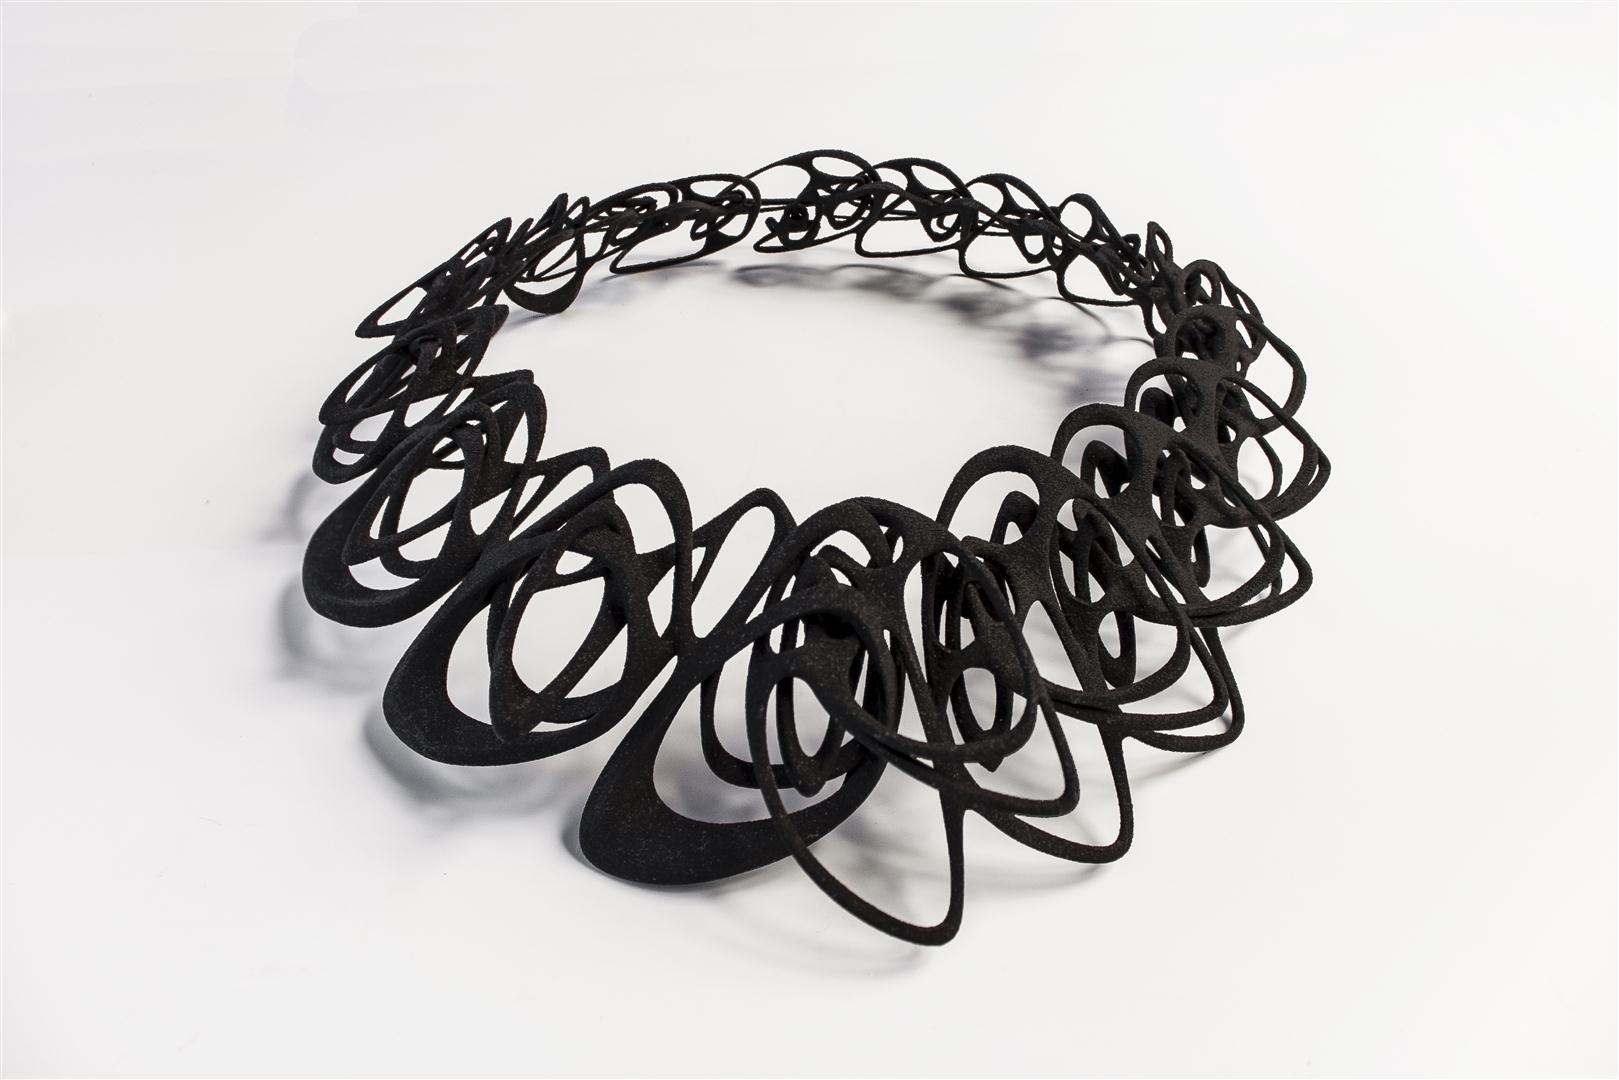 Jenny Wu 3-D printed jewelry